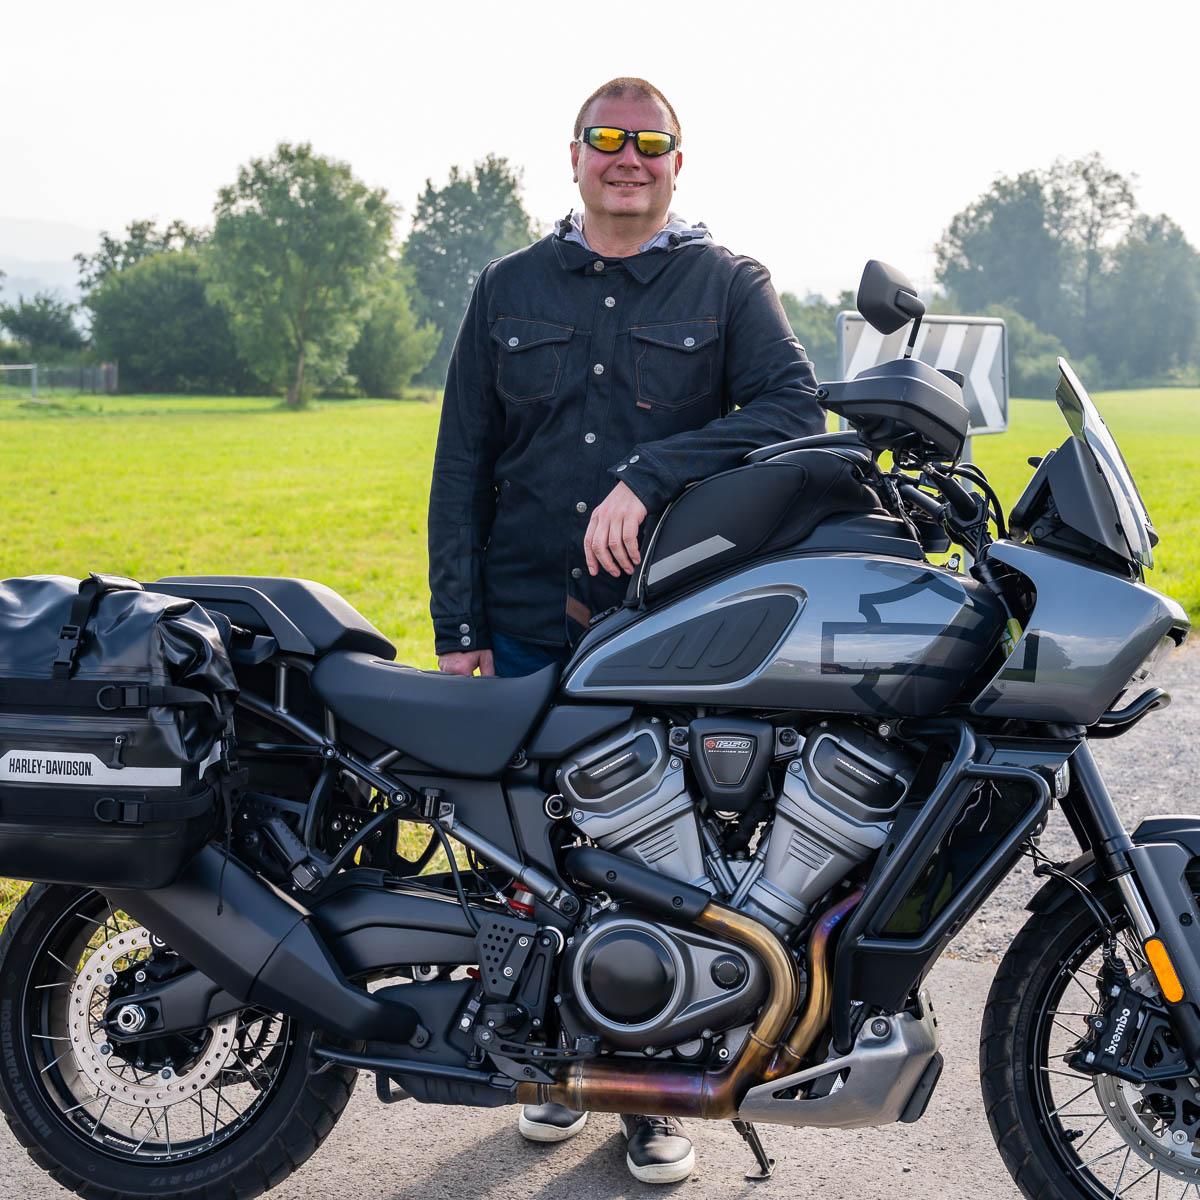 Reto - moto-lifestyle.ch